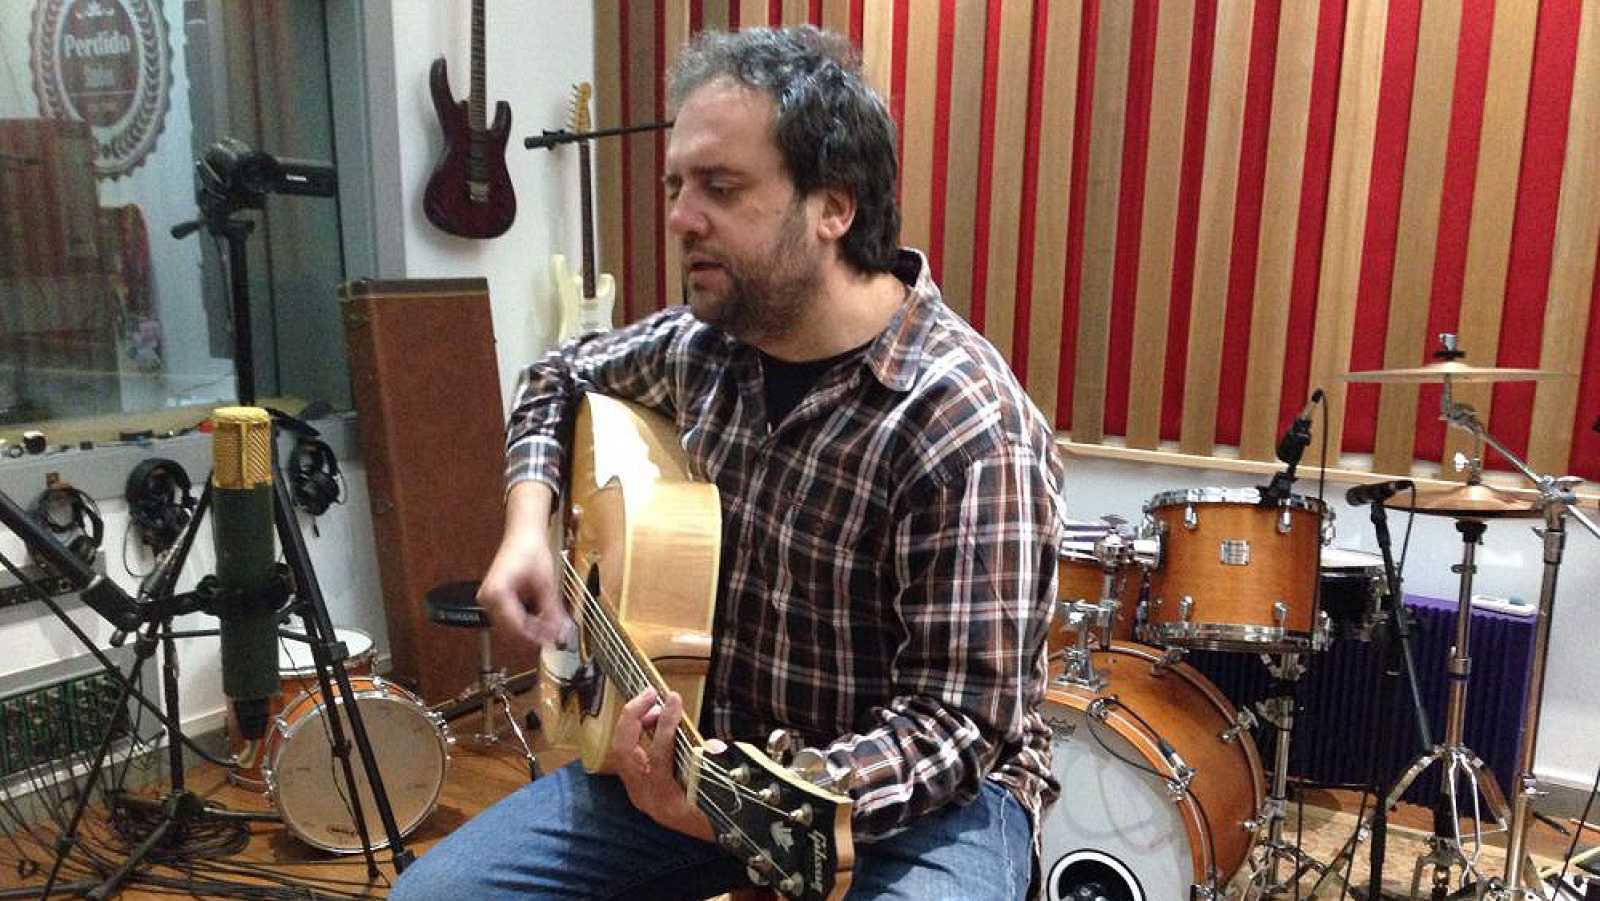 Heliotropo - Juan Ramón Jiménez por Domingo Henares - 28/10/18 - escuchar ahora